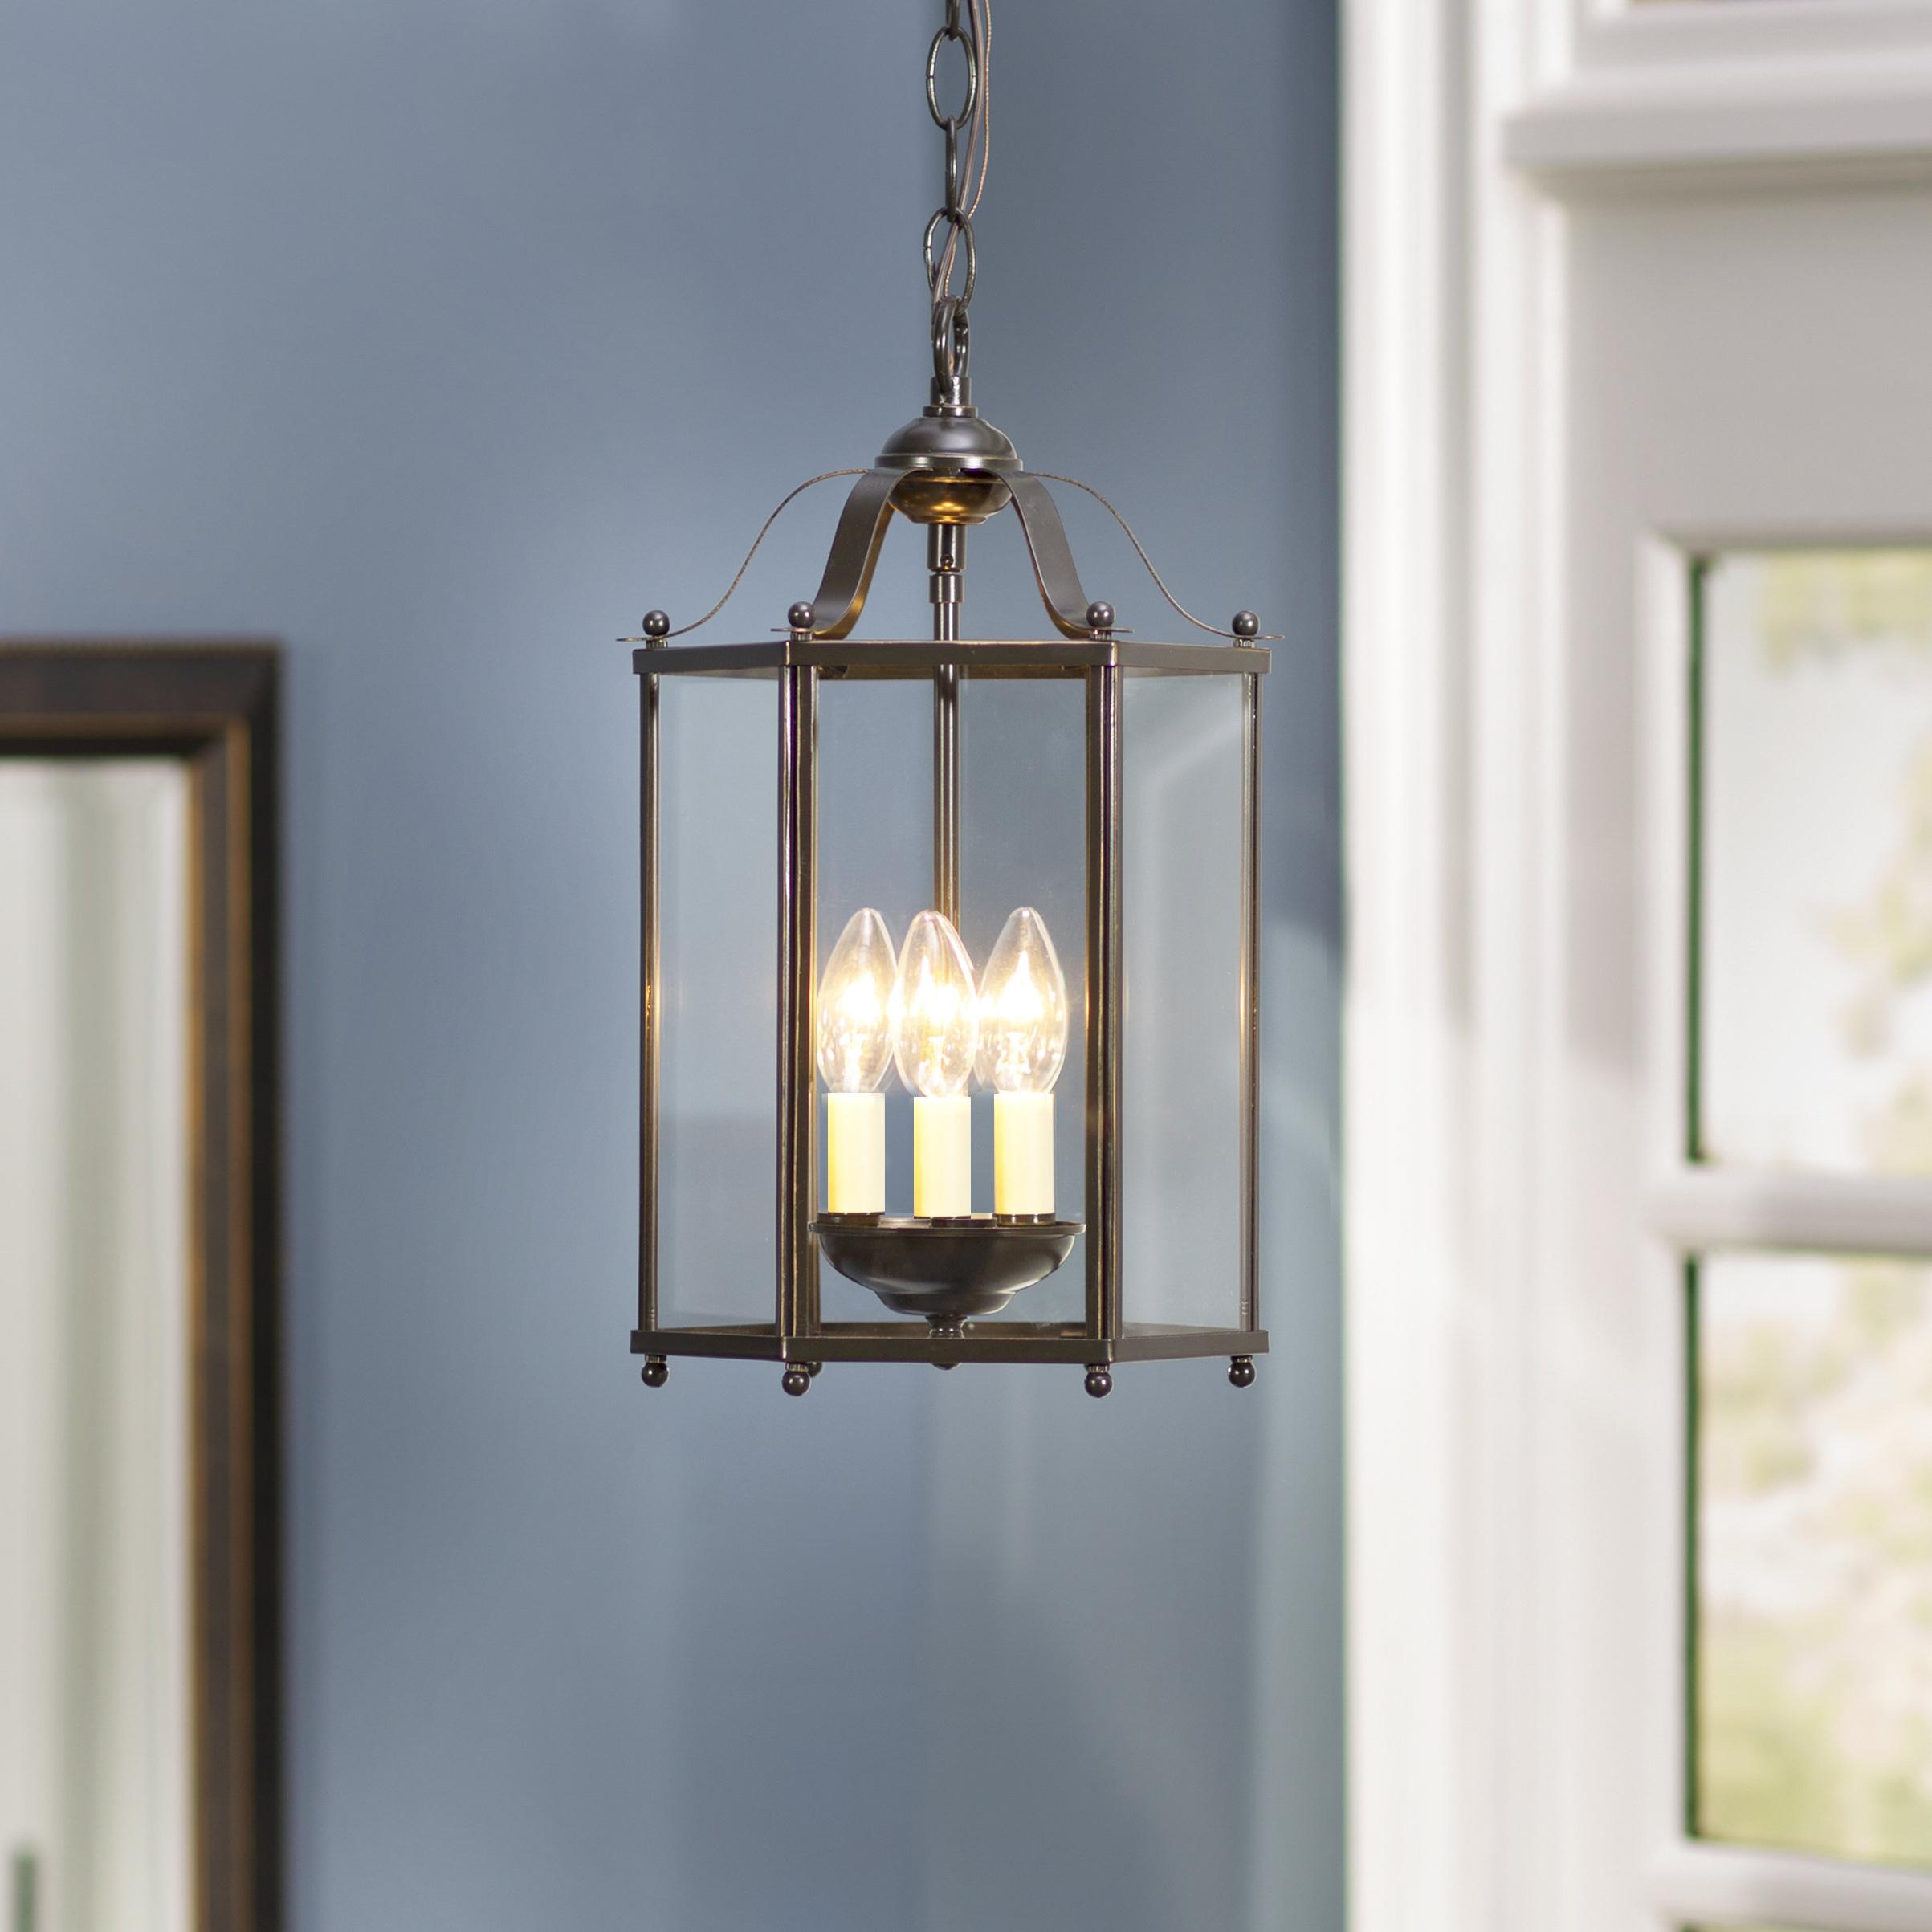 Featured Photo of Leiters 3 Light Lantern Geometric Pendants